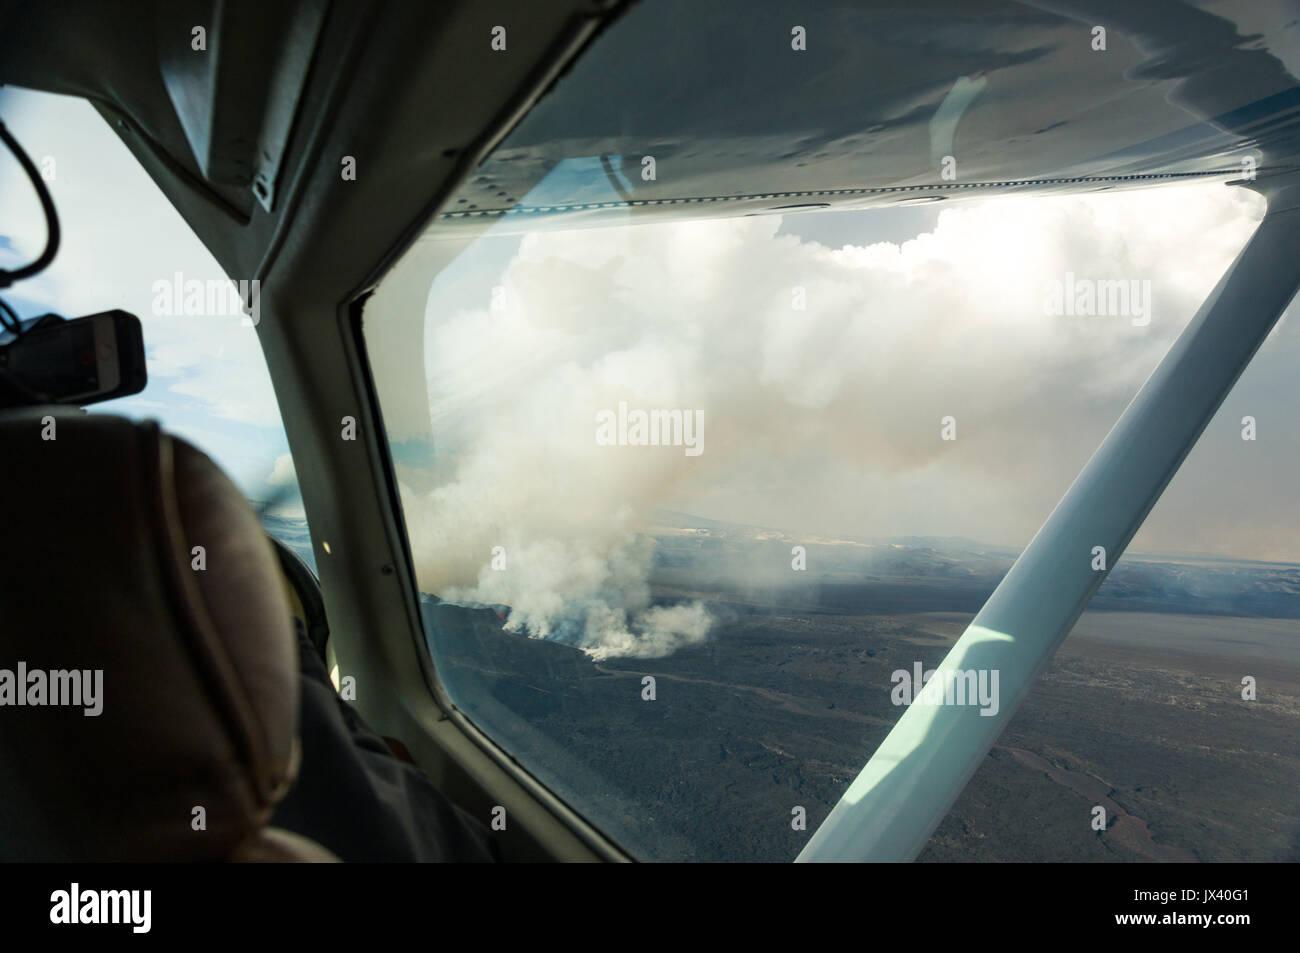 Aerial view from plane interior of Bárðarbunga Holuhraun volcano caldera lava flow in Iceland, October 2014 Stock Photo